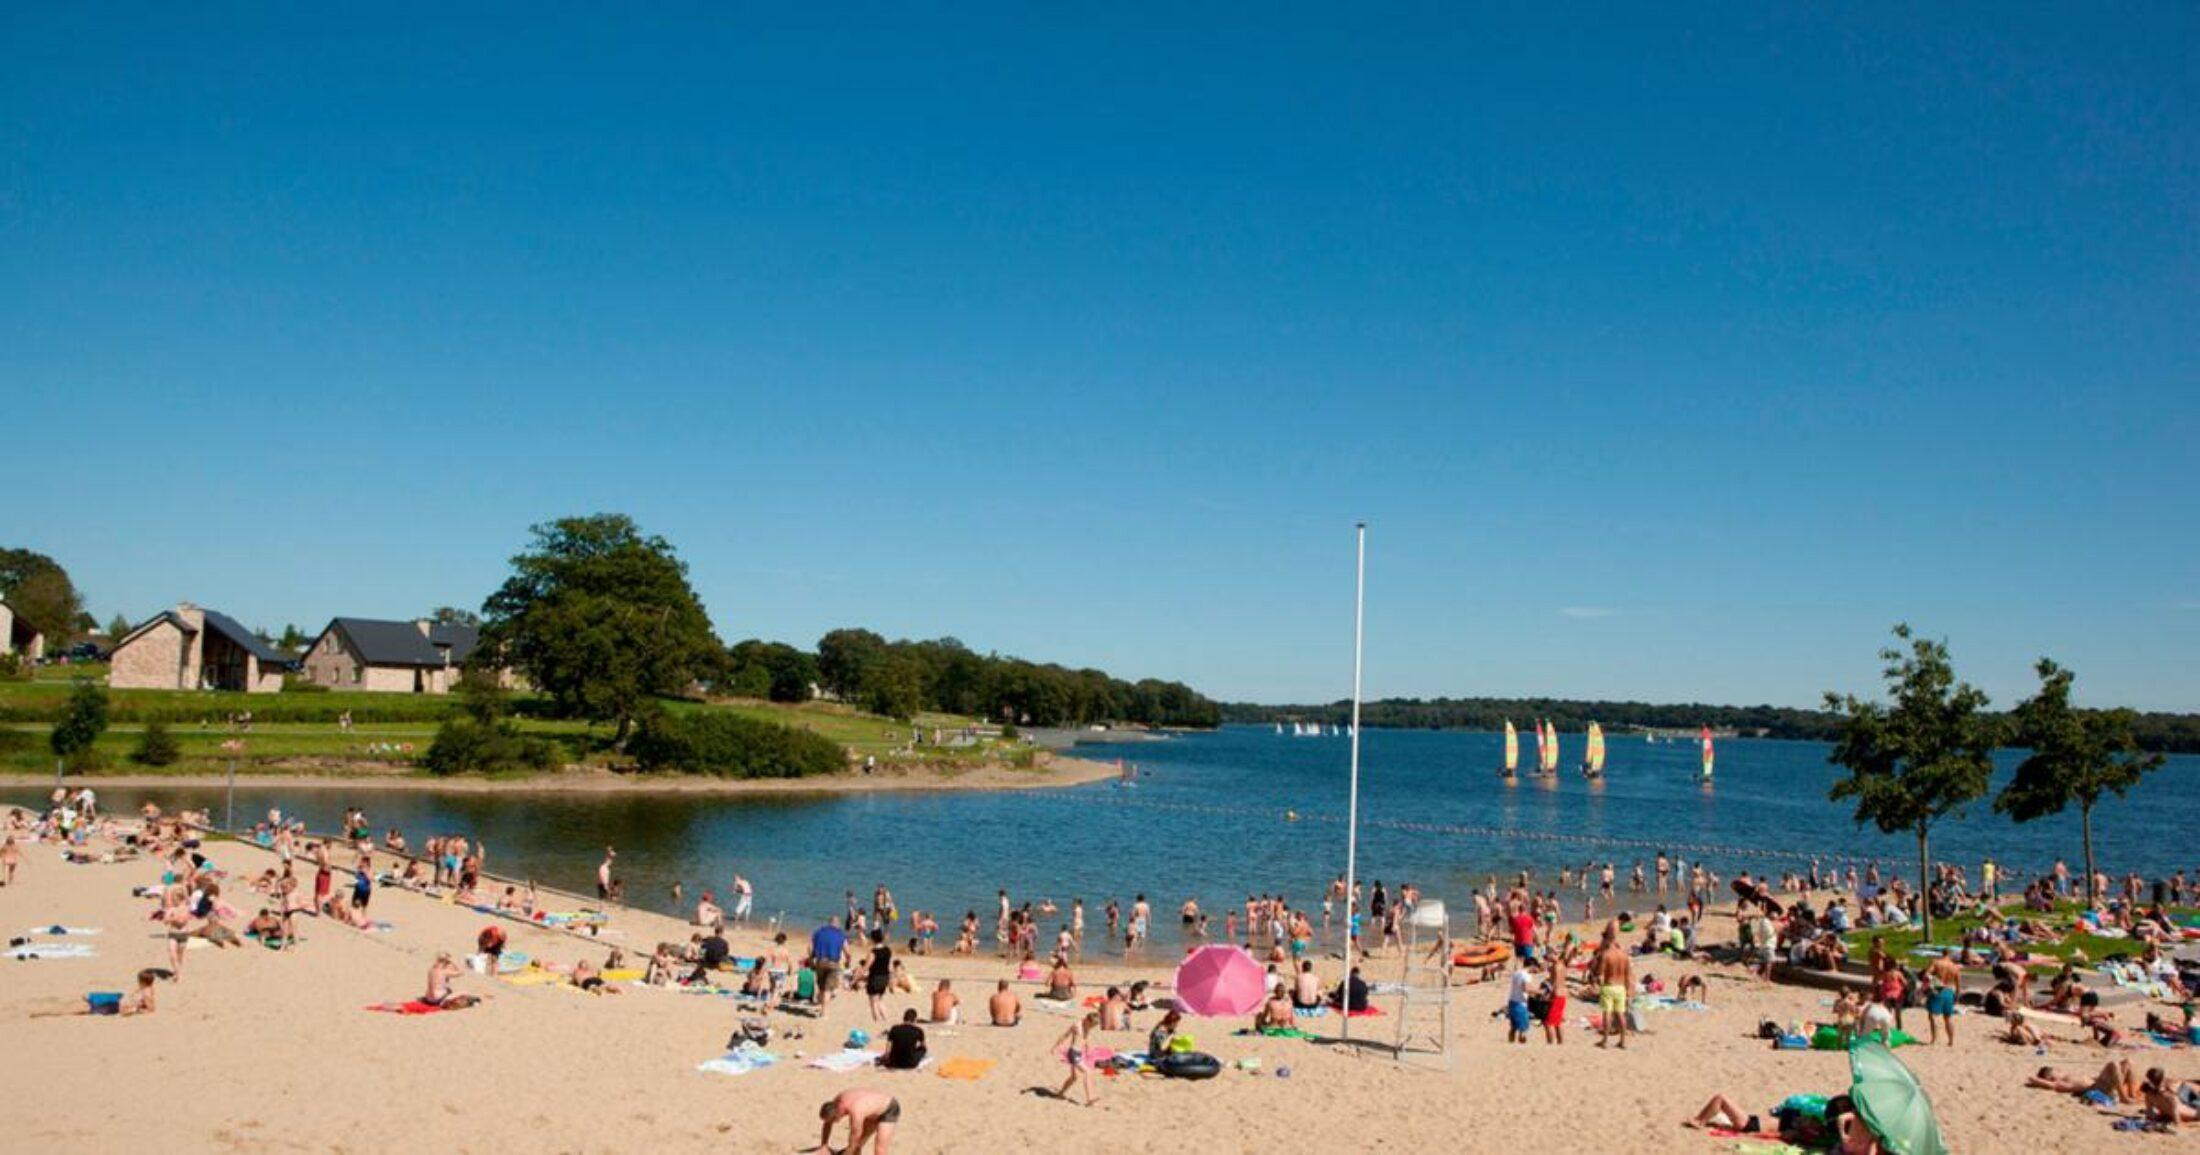 Waar in Charleroi Métropole kunt u deze zomer zwemmen in openlucht?